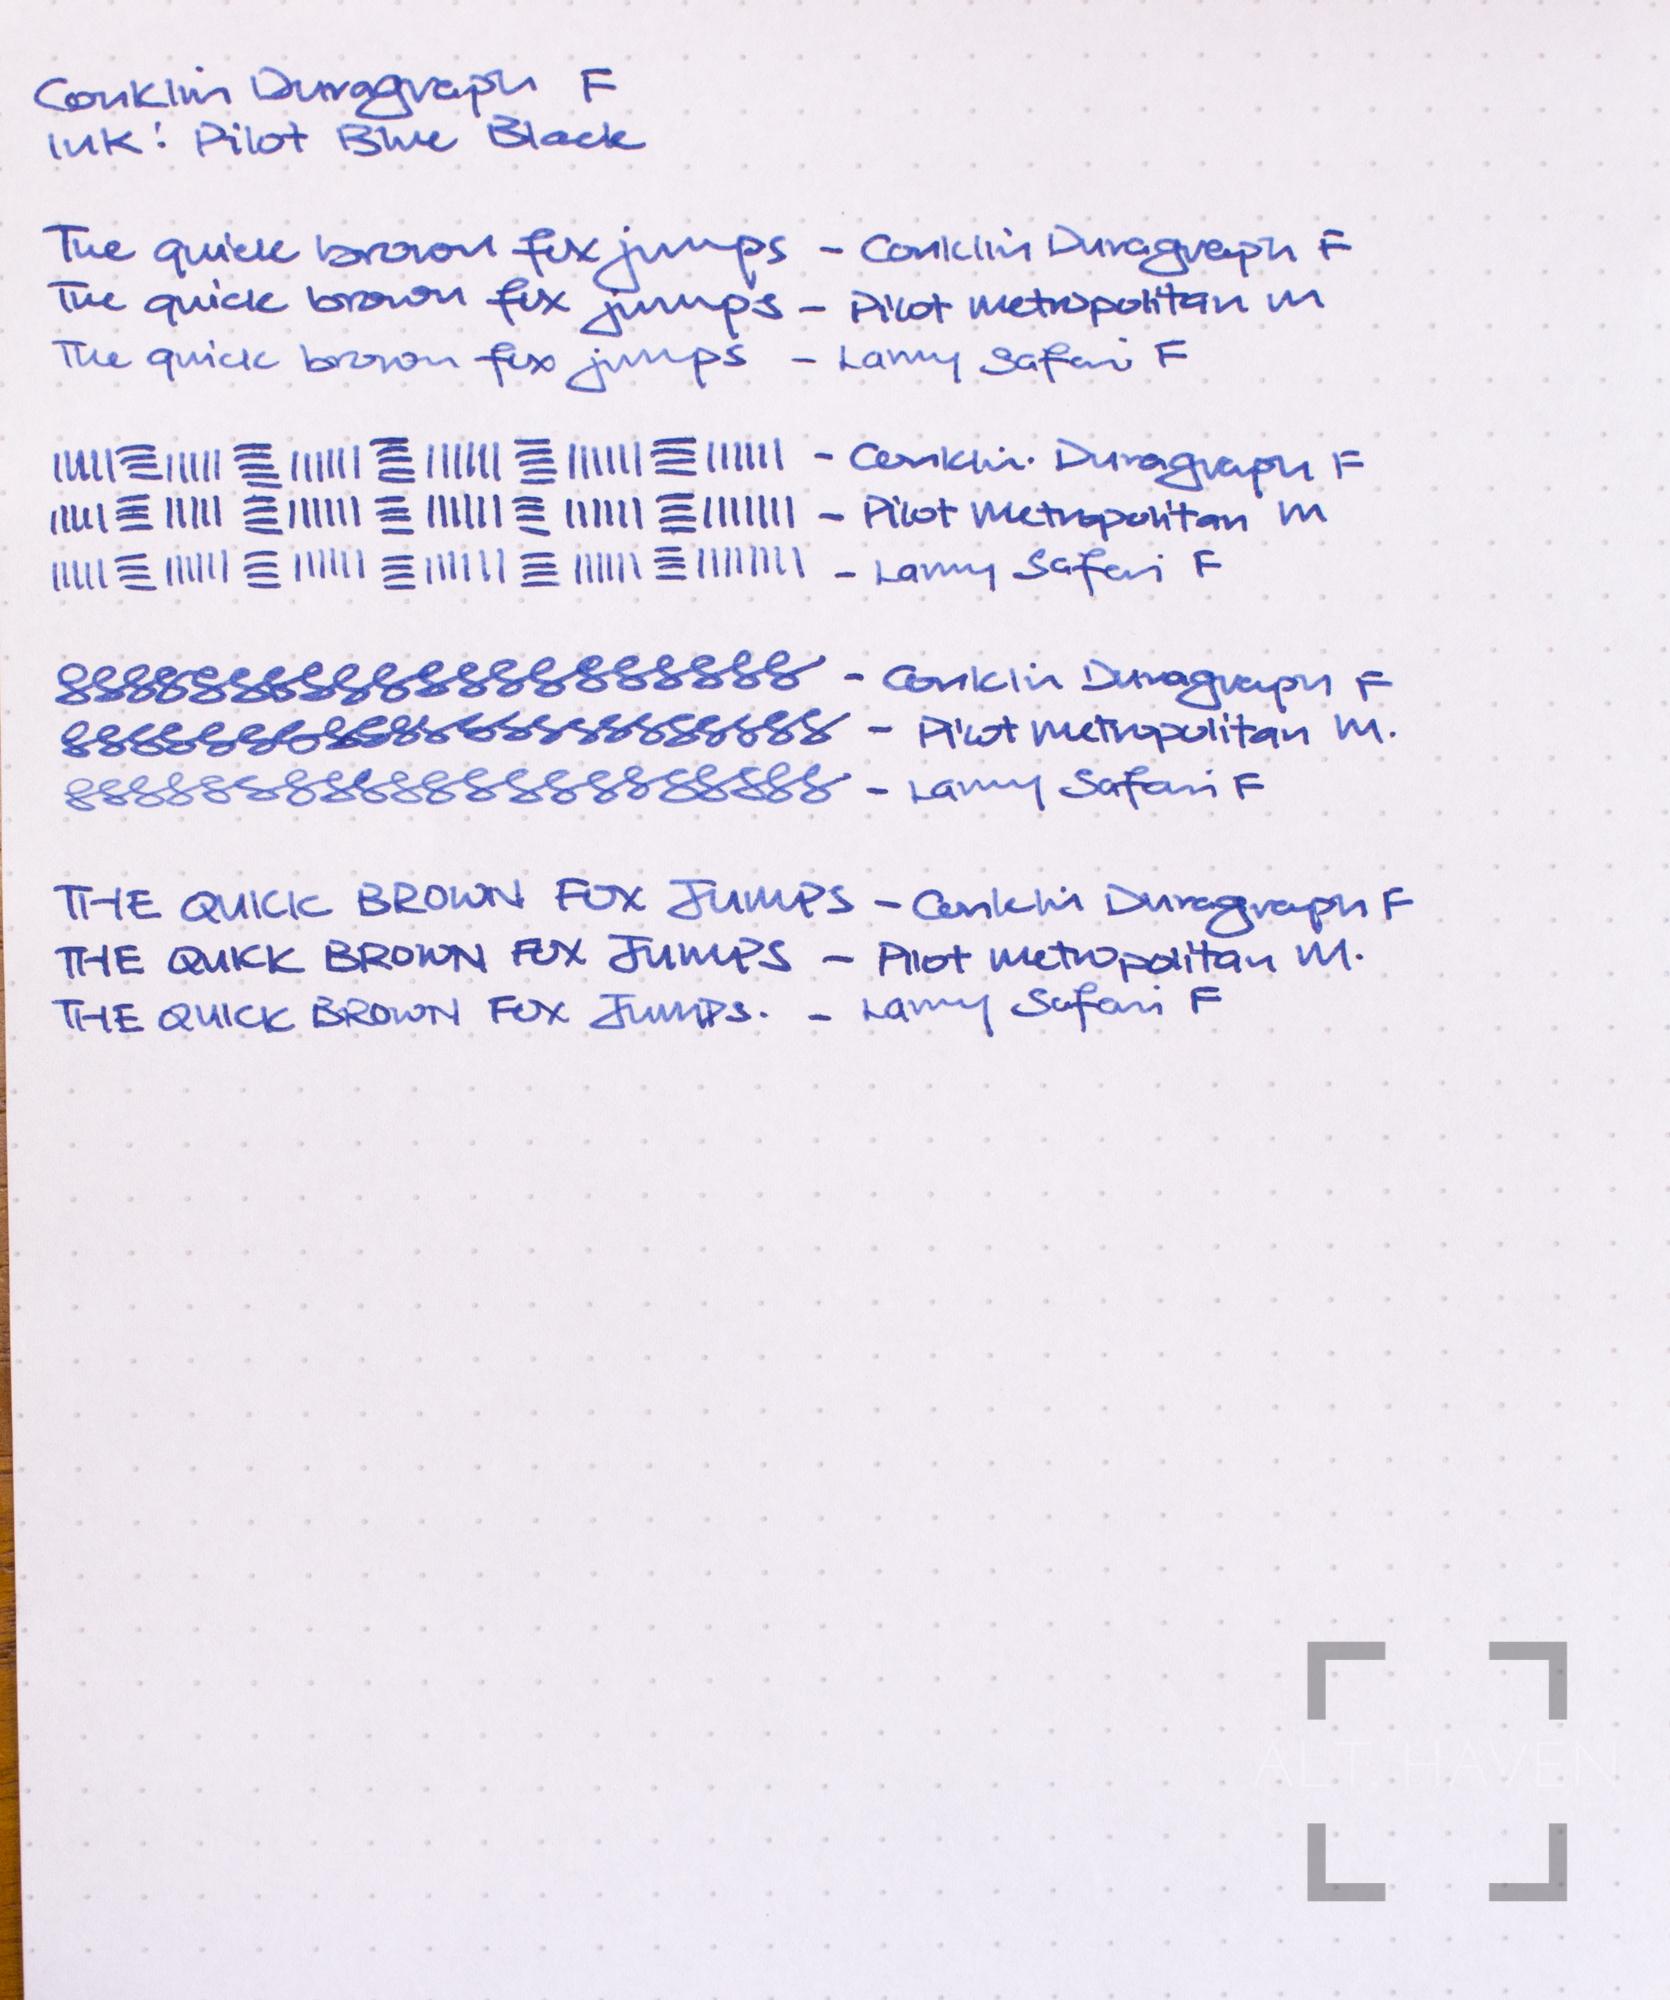 Conklin Duragraph.jpg